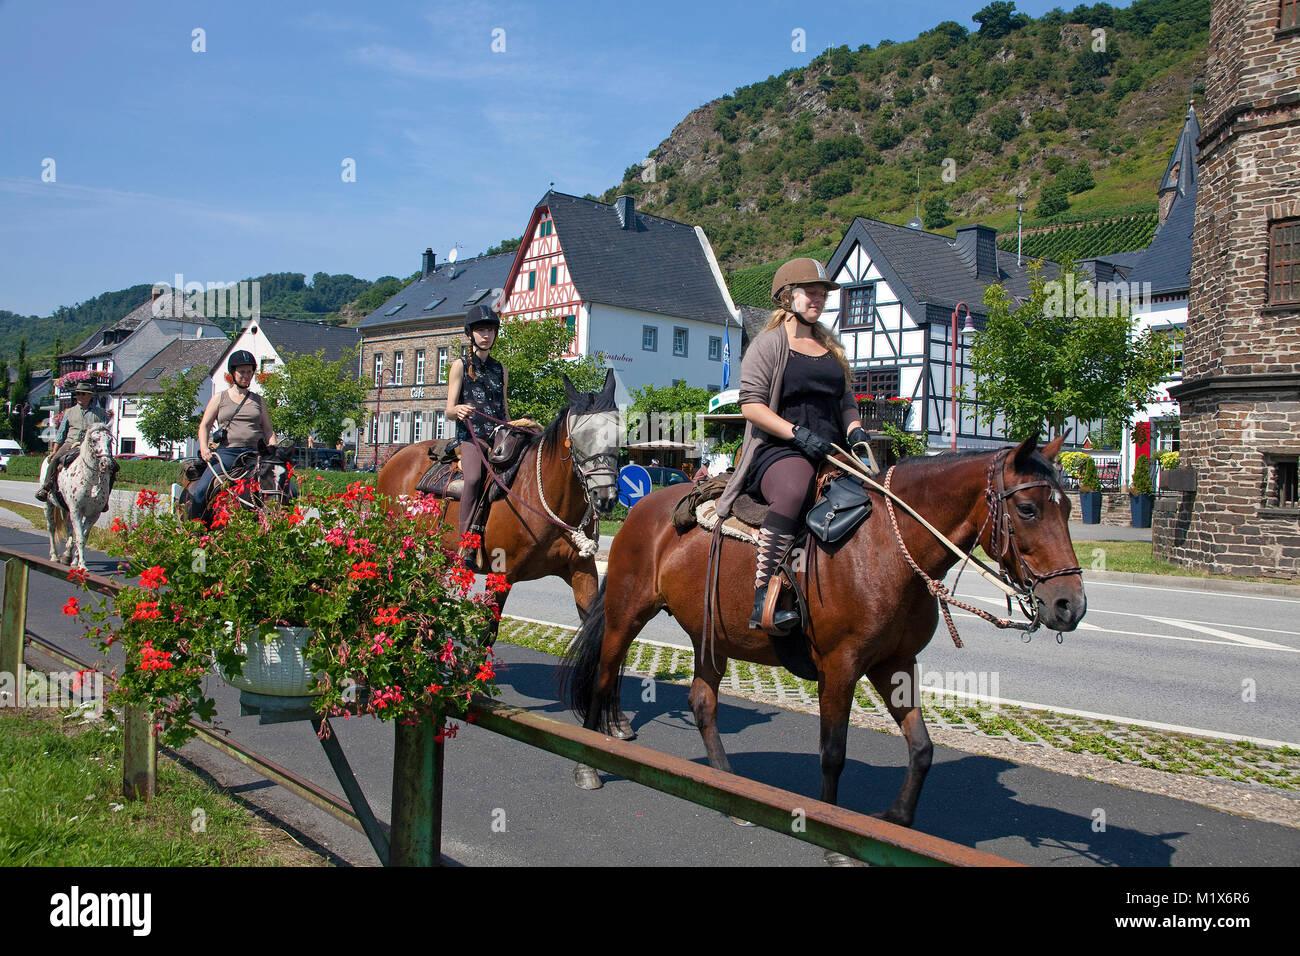 Horseback riding at riverside of Moselle river, Hatzenport, Moselle river, Rhineland-Palatinate, Germany, Europe Stock Photo